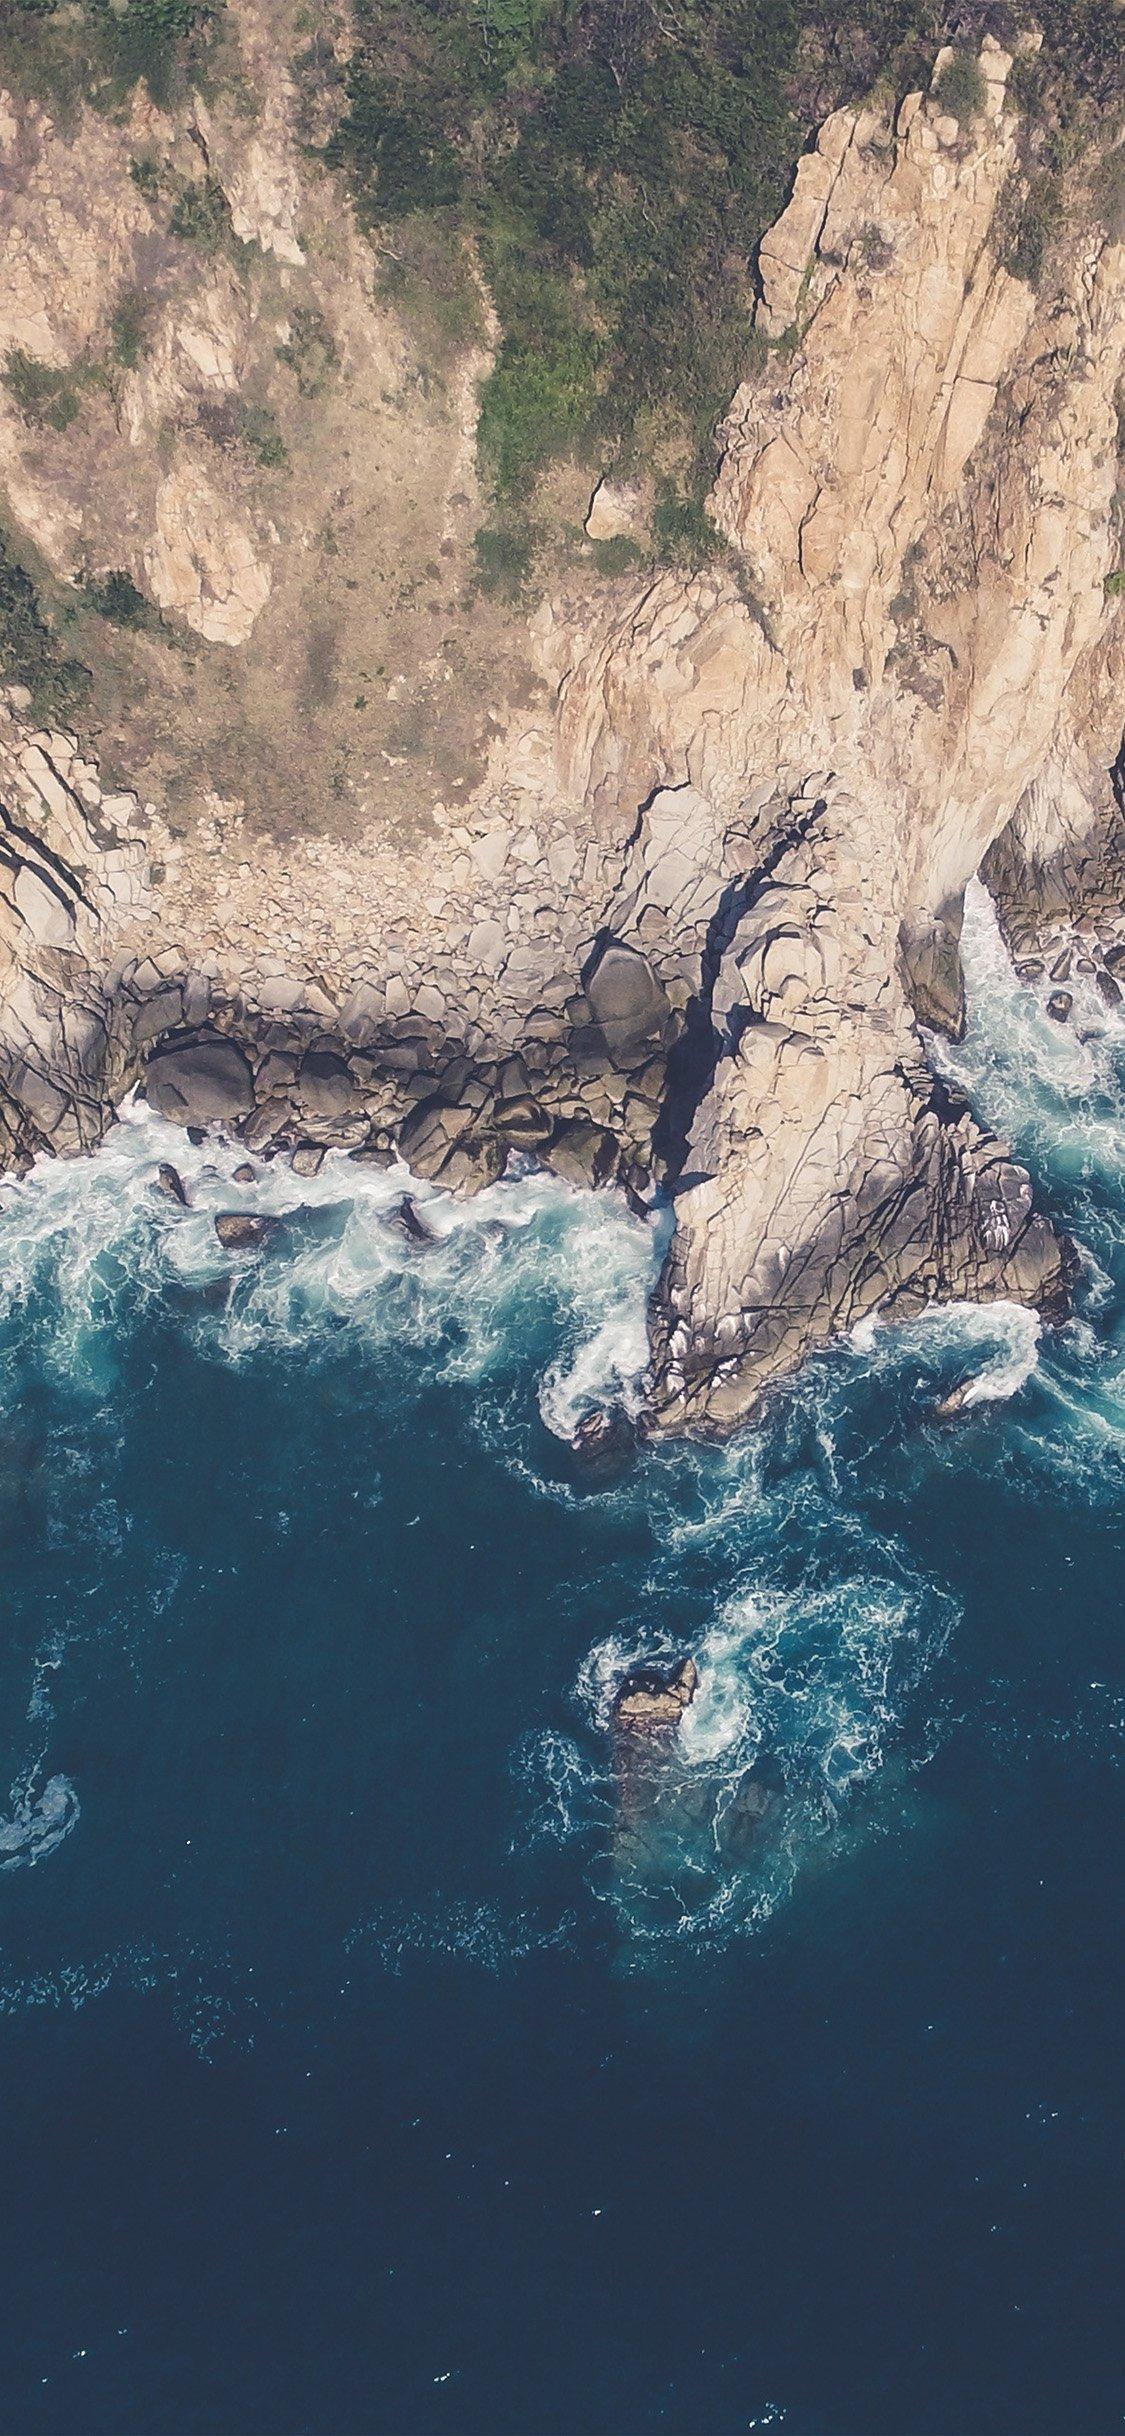 Iphone X Sea Beach Wallpaper